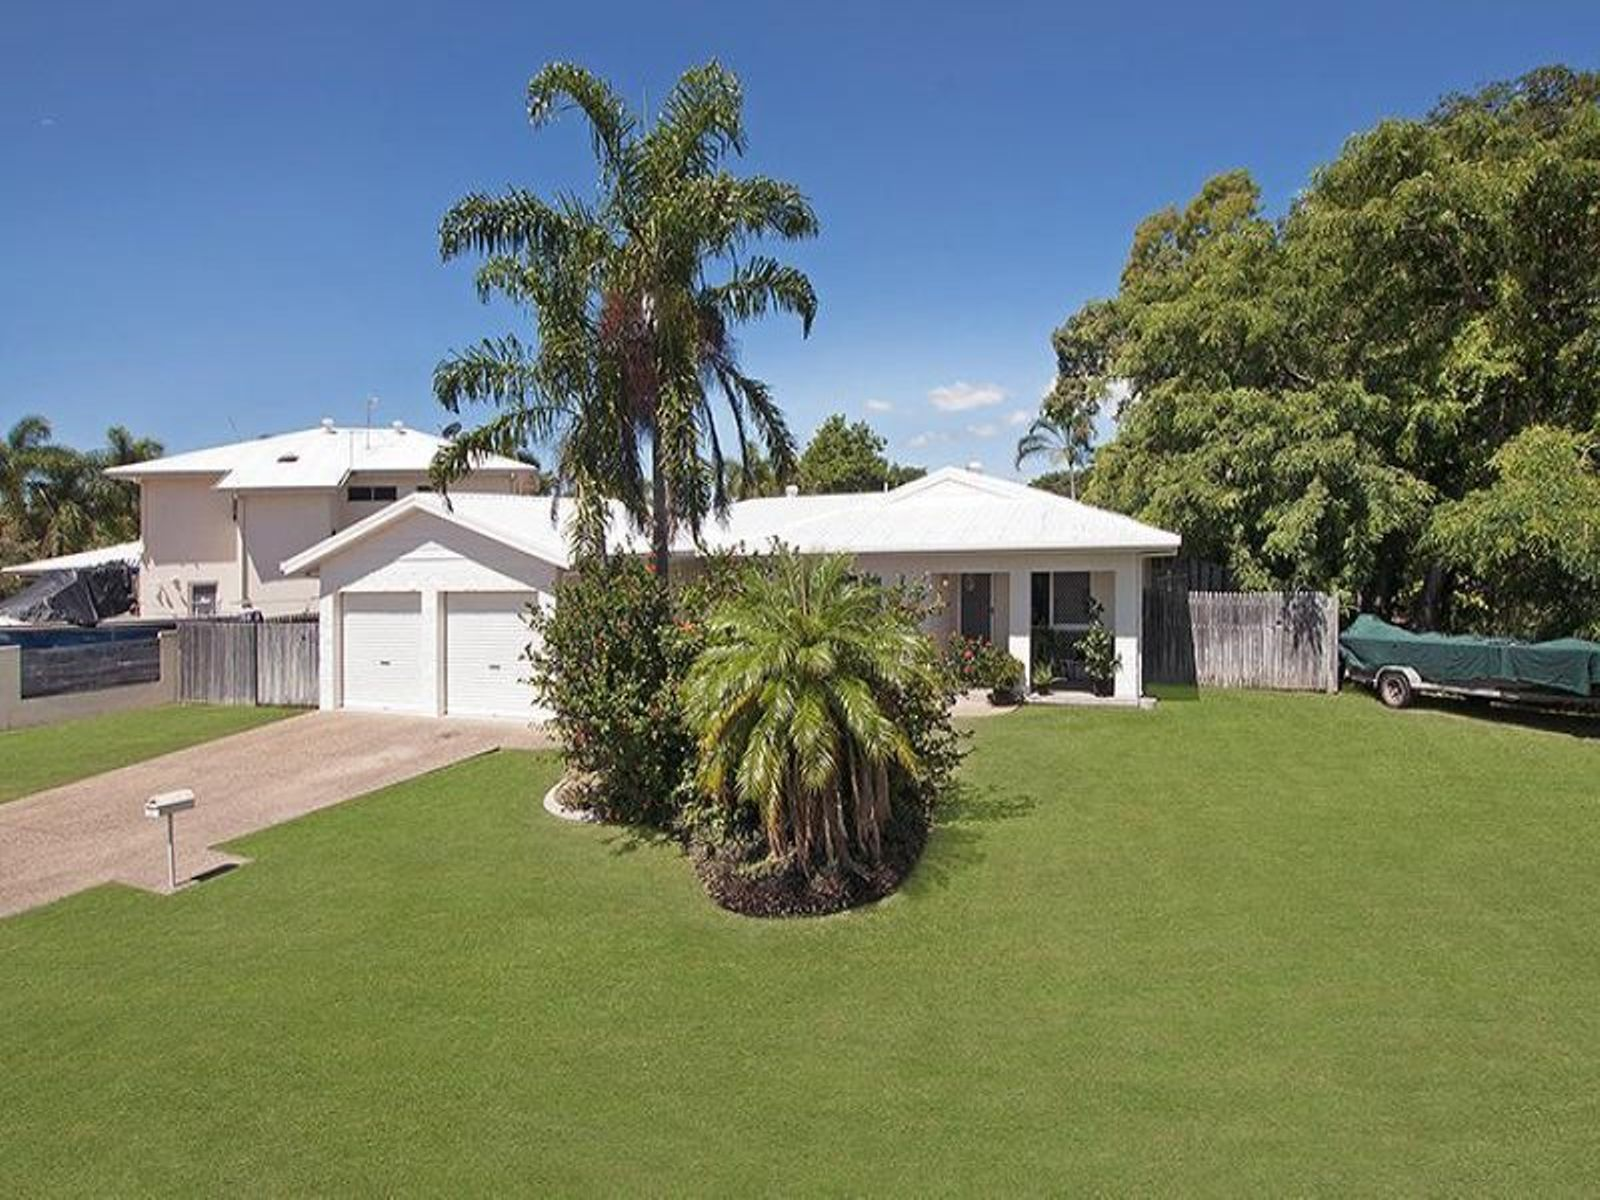 47 Eucalyptus Drive, Annandale, QLD 4814